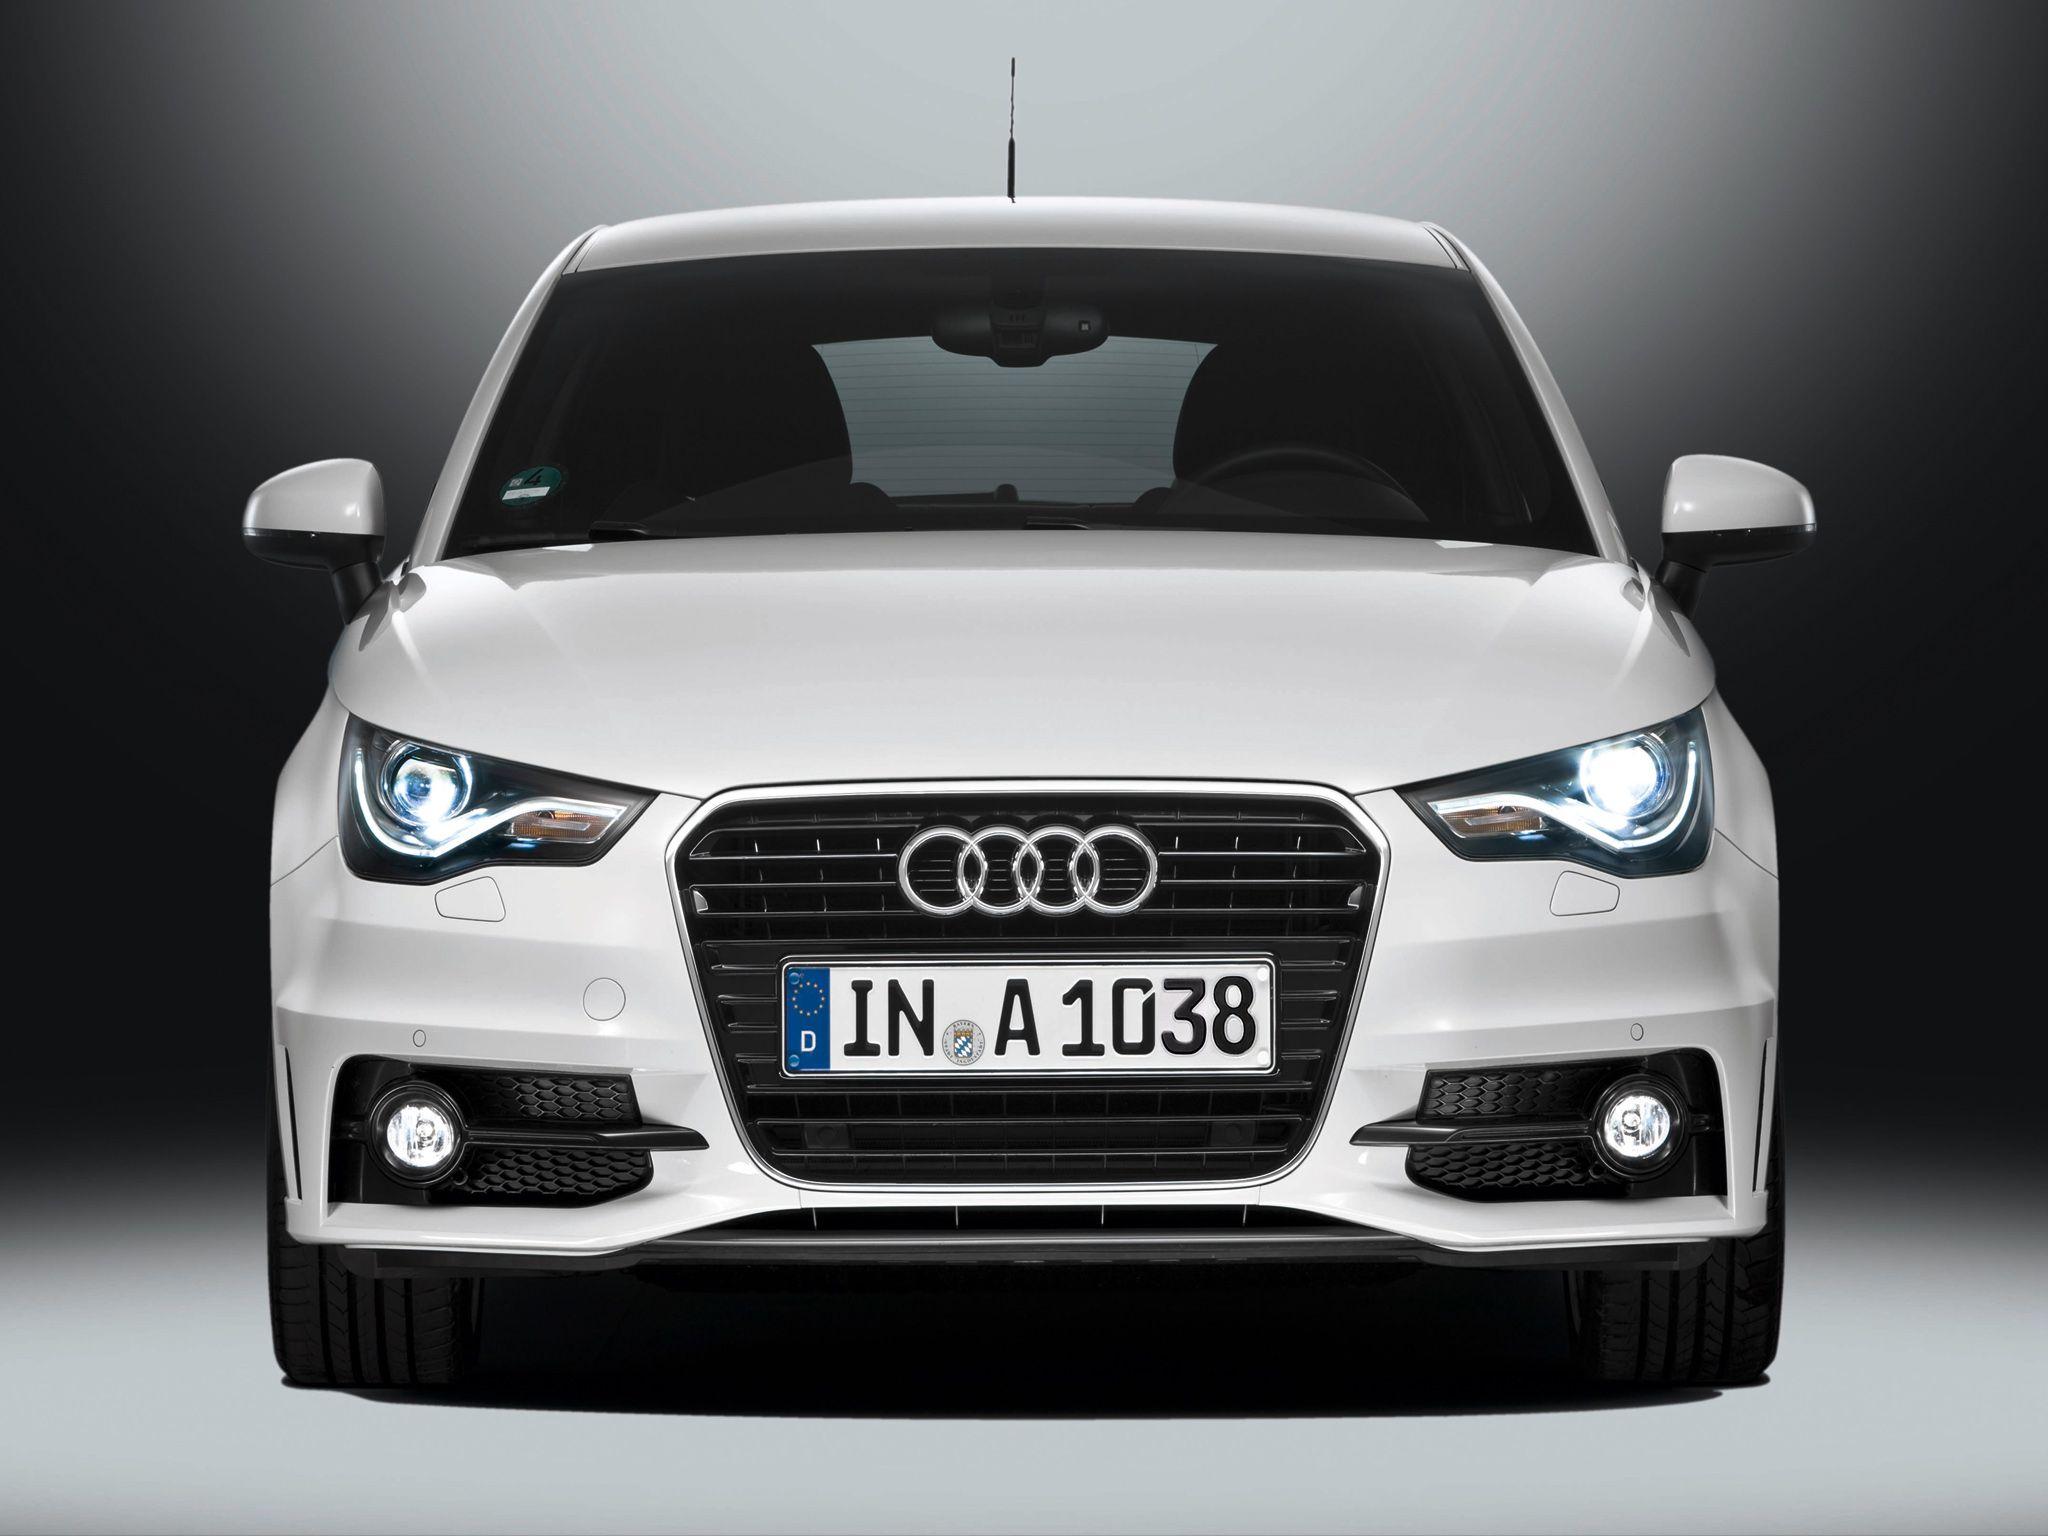 2012 Audi A1 S Line Audi A1 Audi Audi A1 S Line